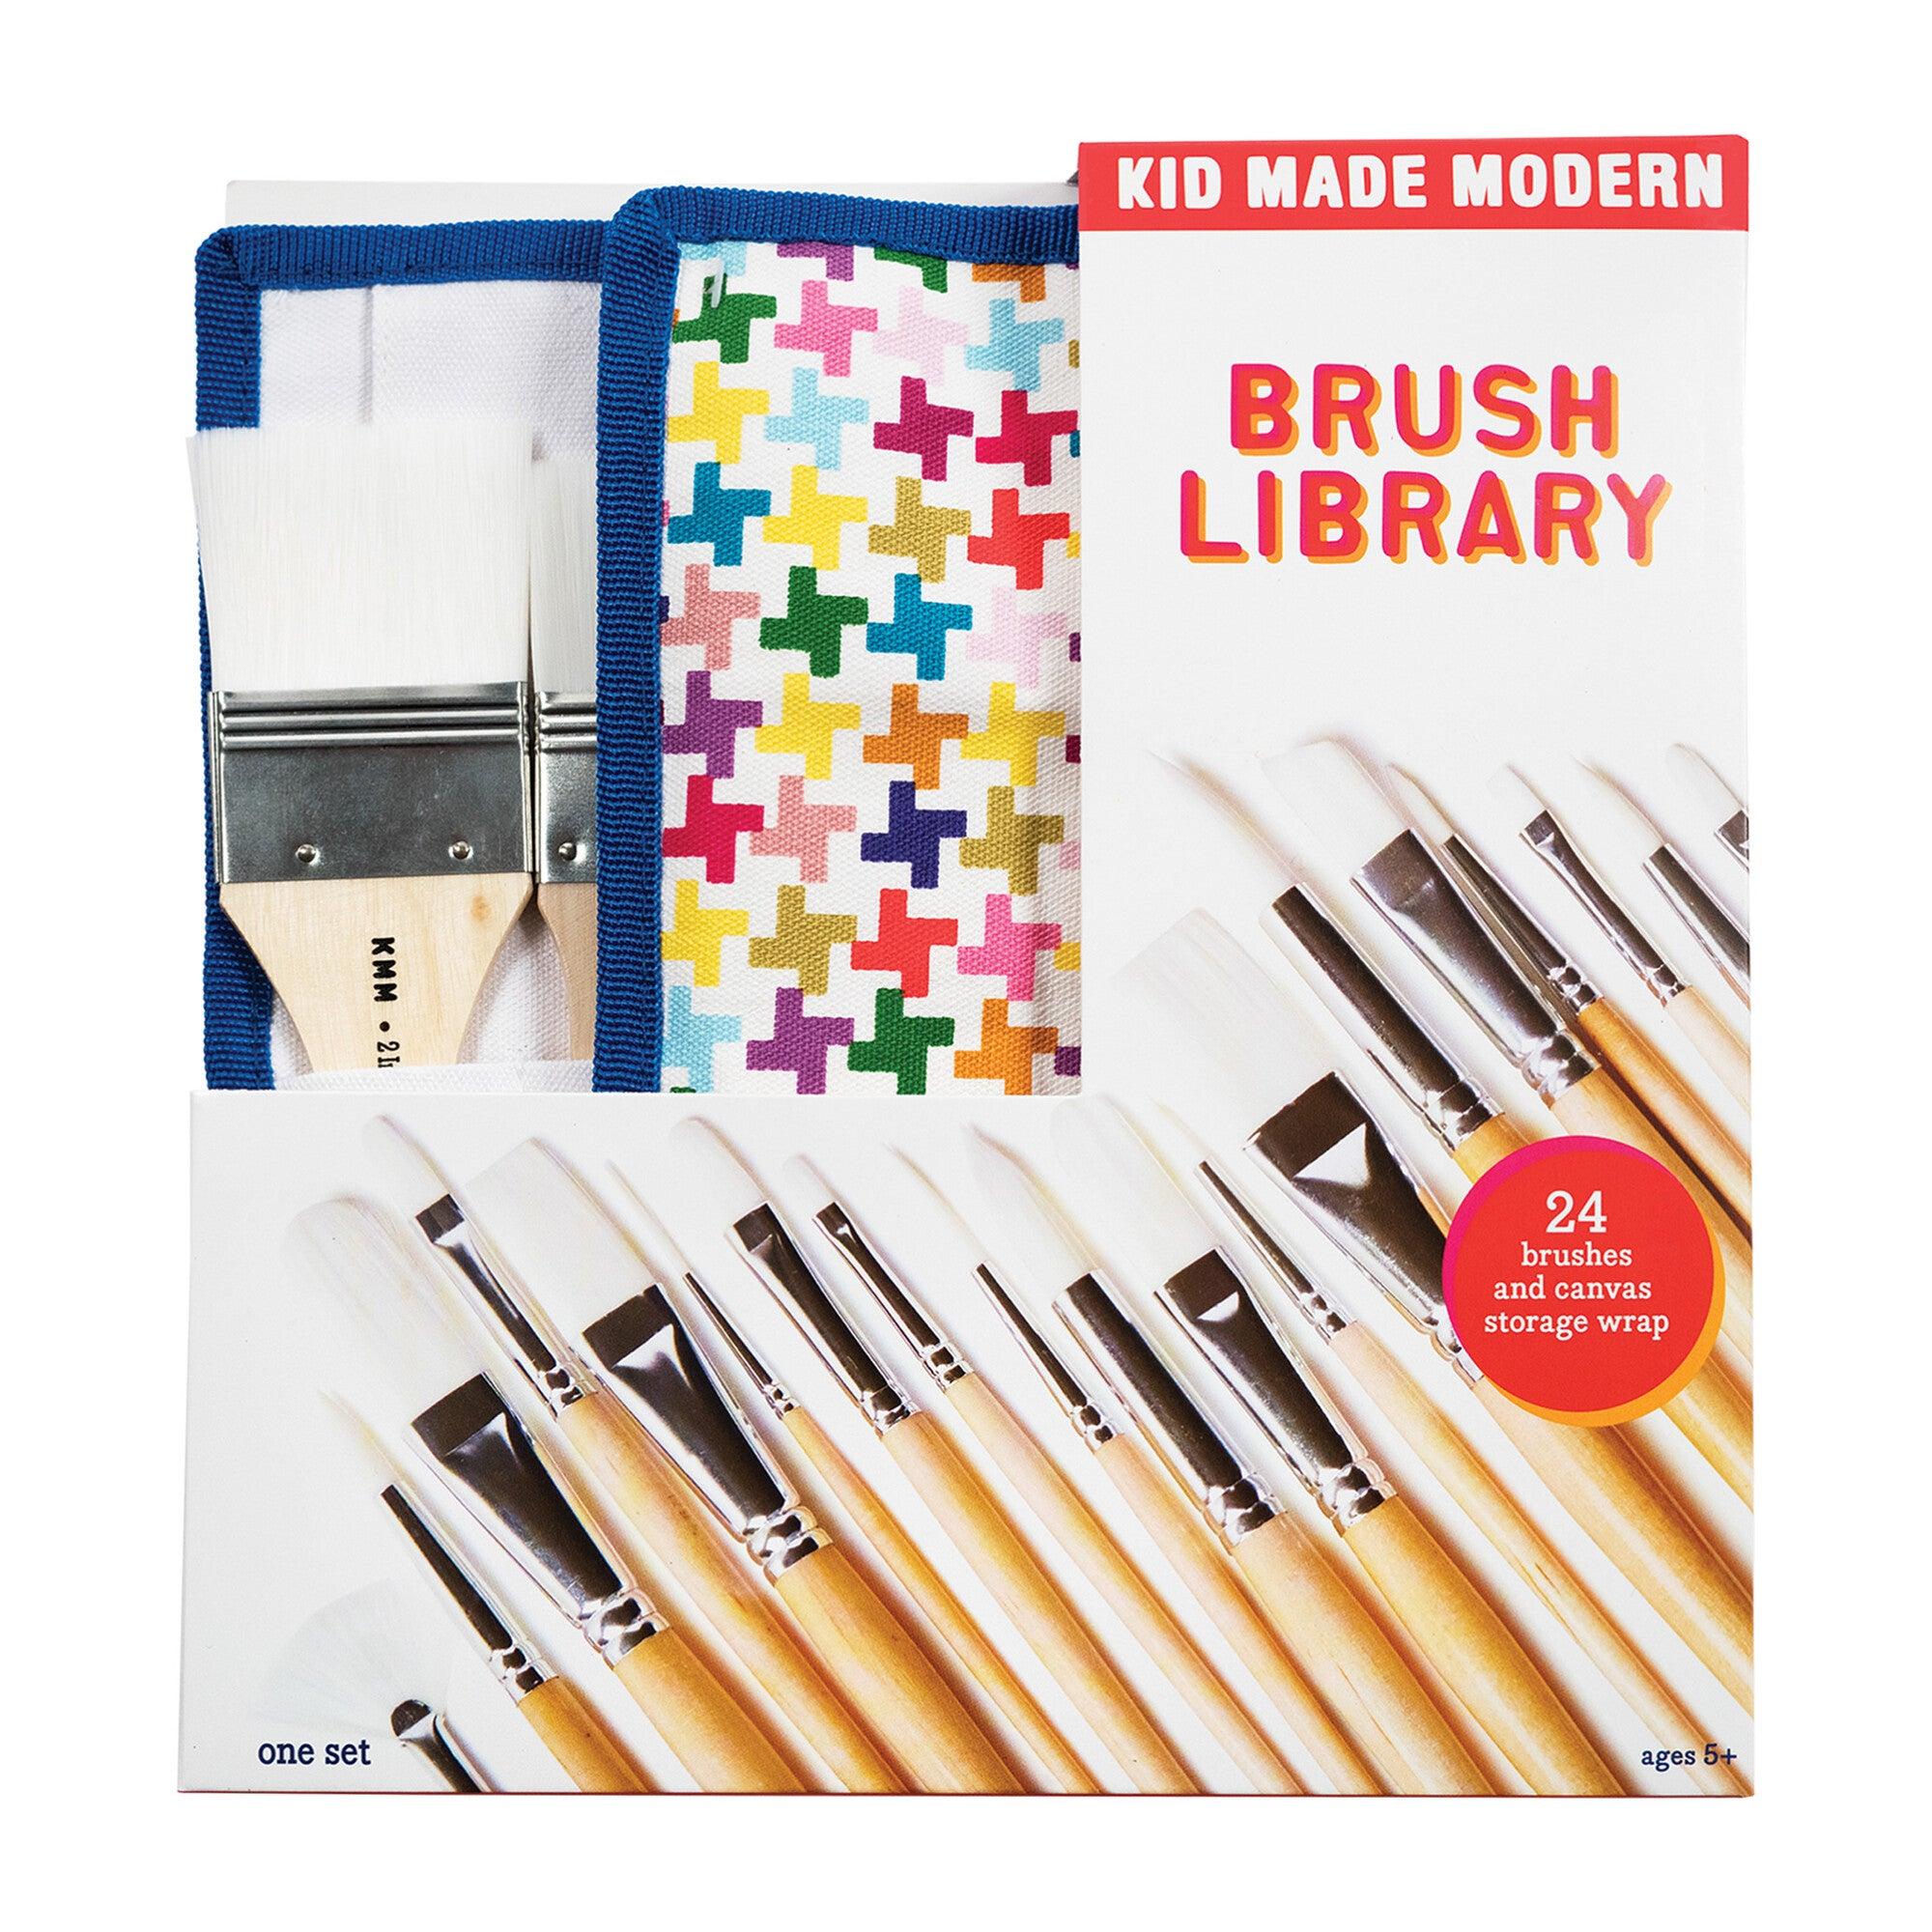 Brush Library